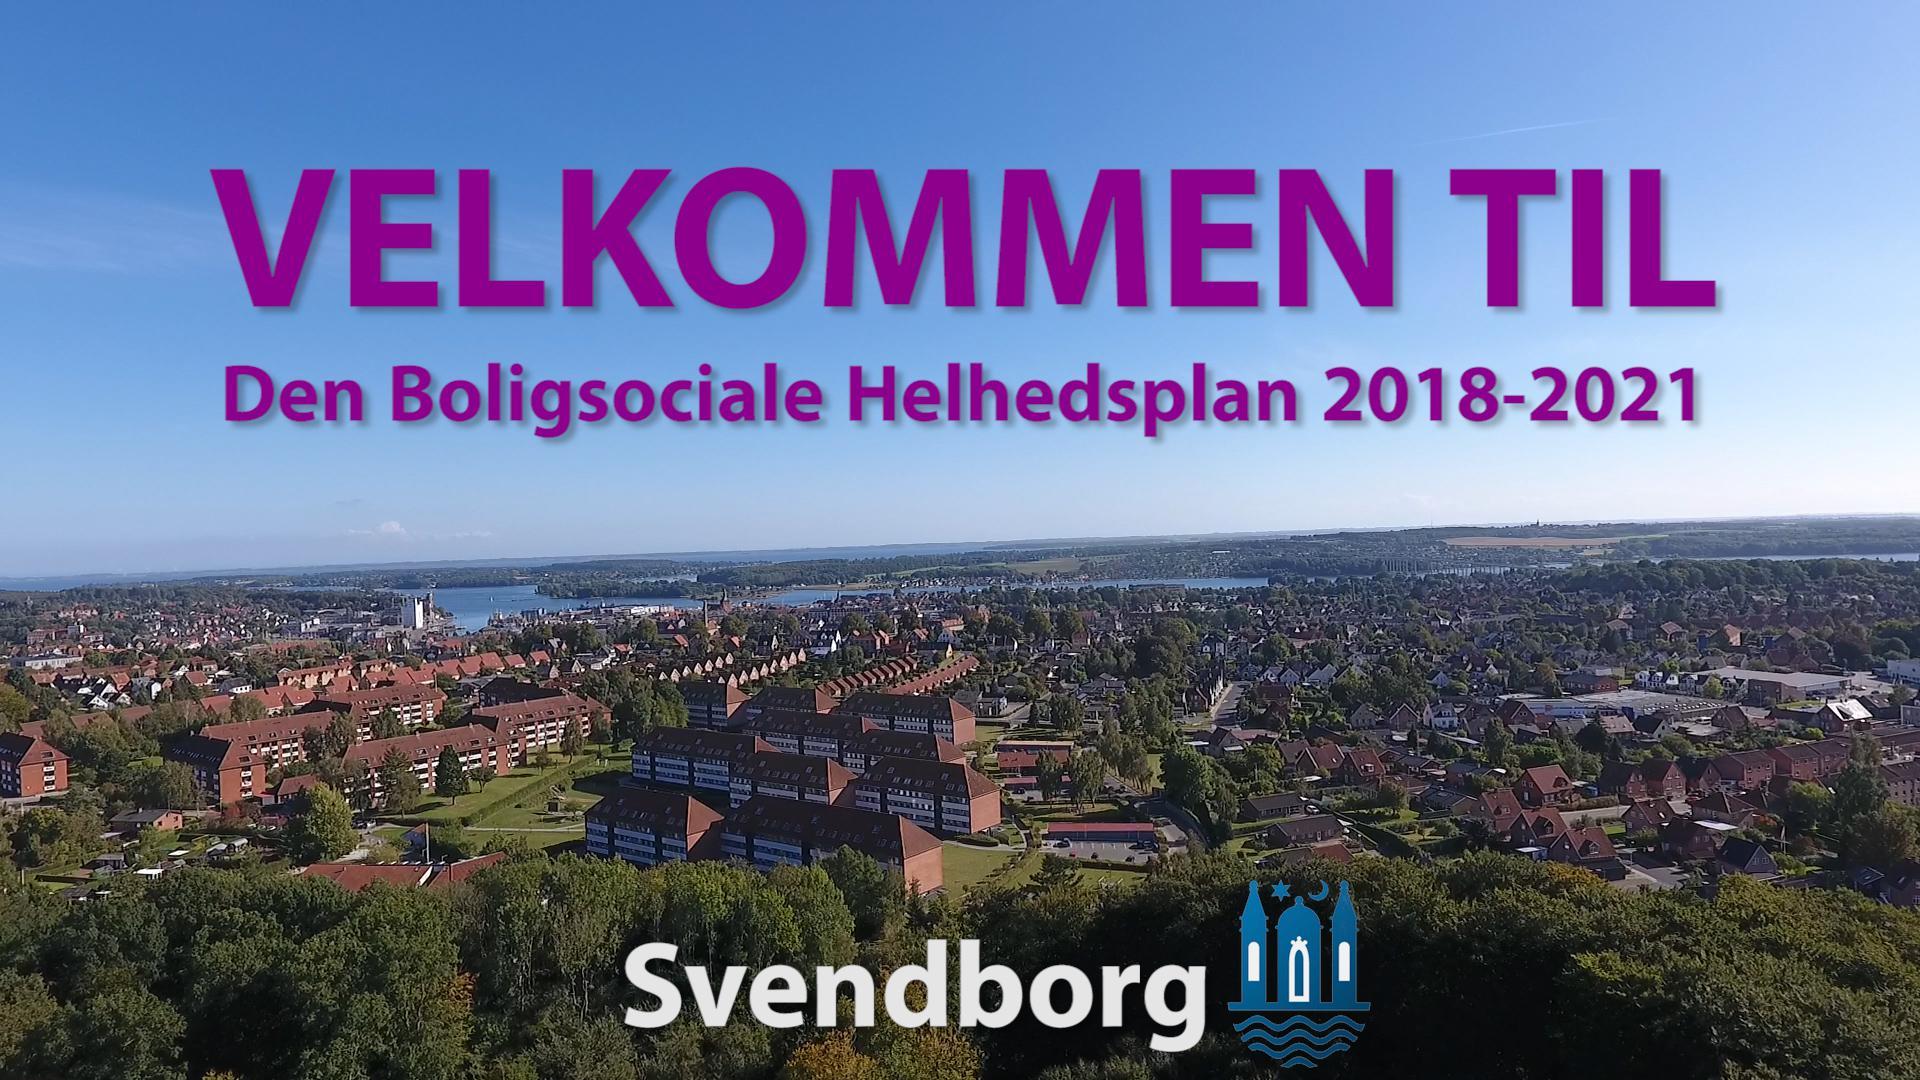 http://jh-medieproduktion.dk/html5video/den-boligsociale-helhedsplan-2018-2021